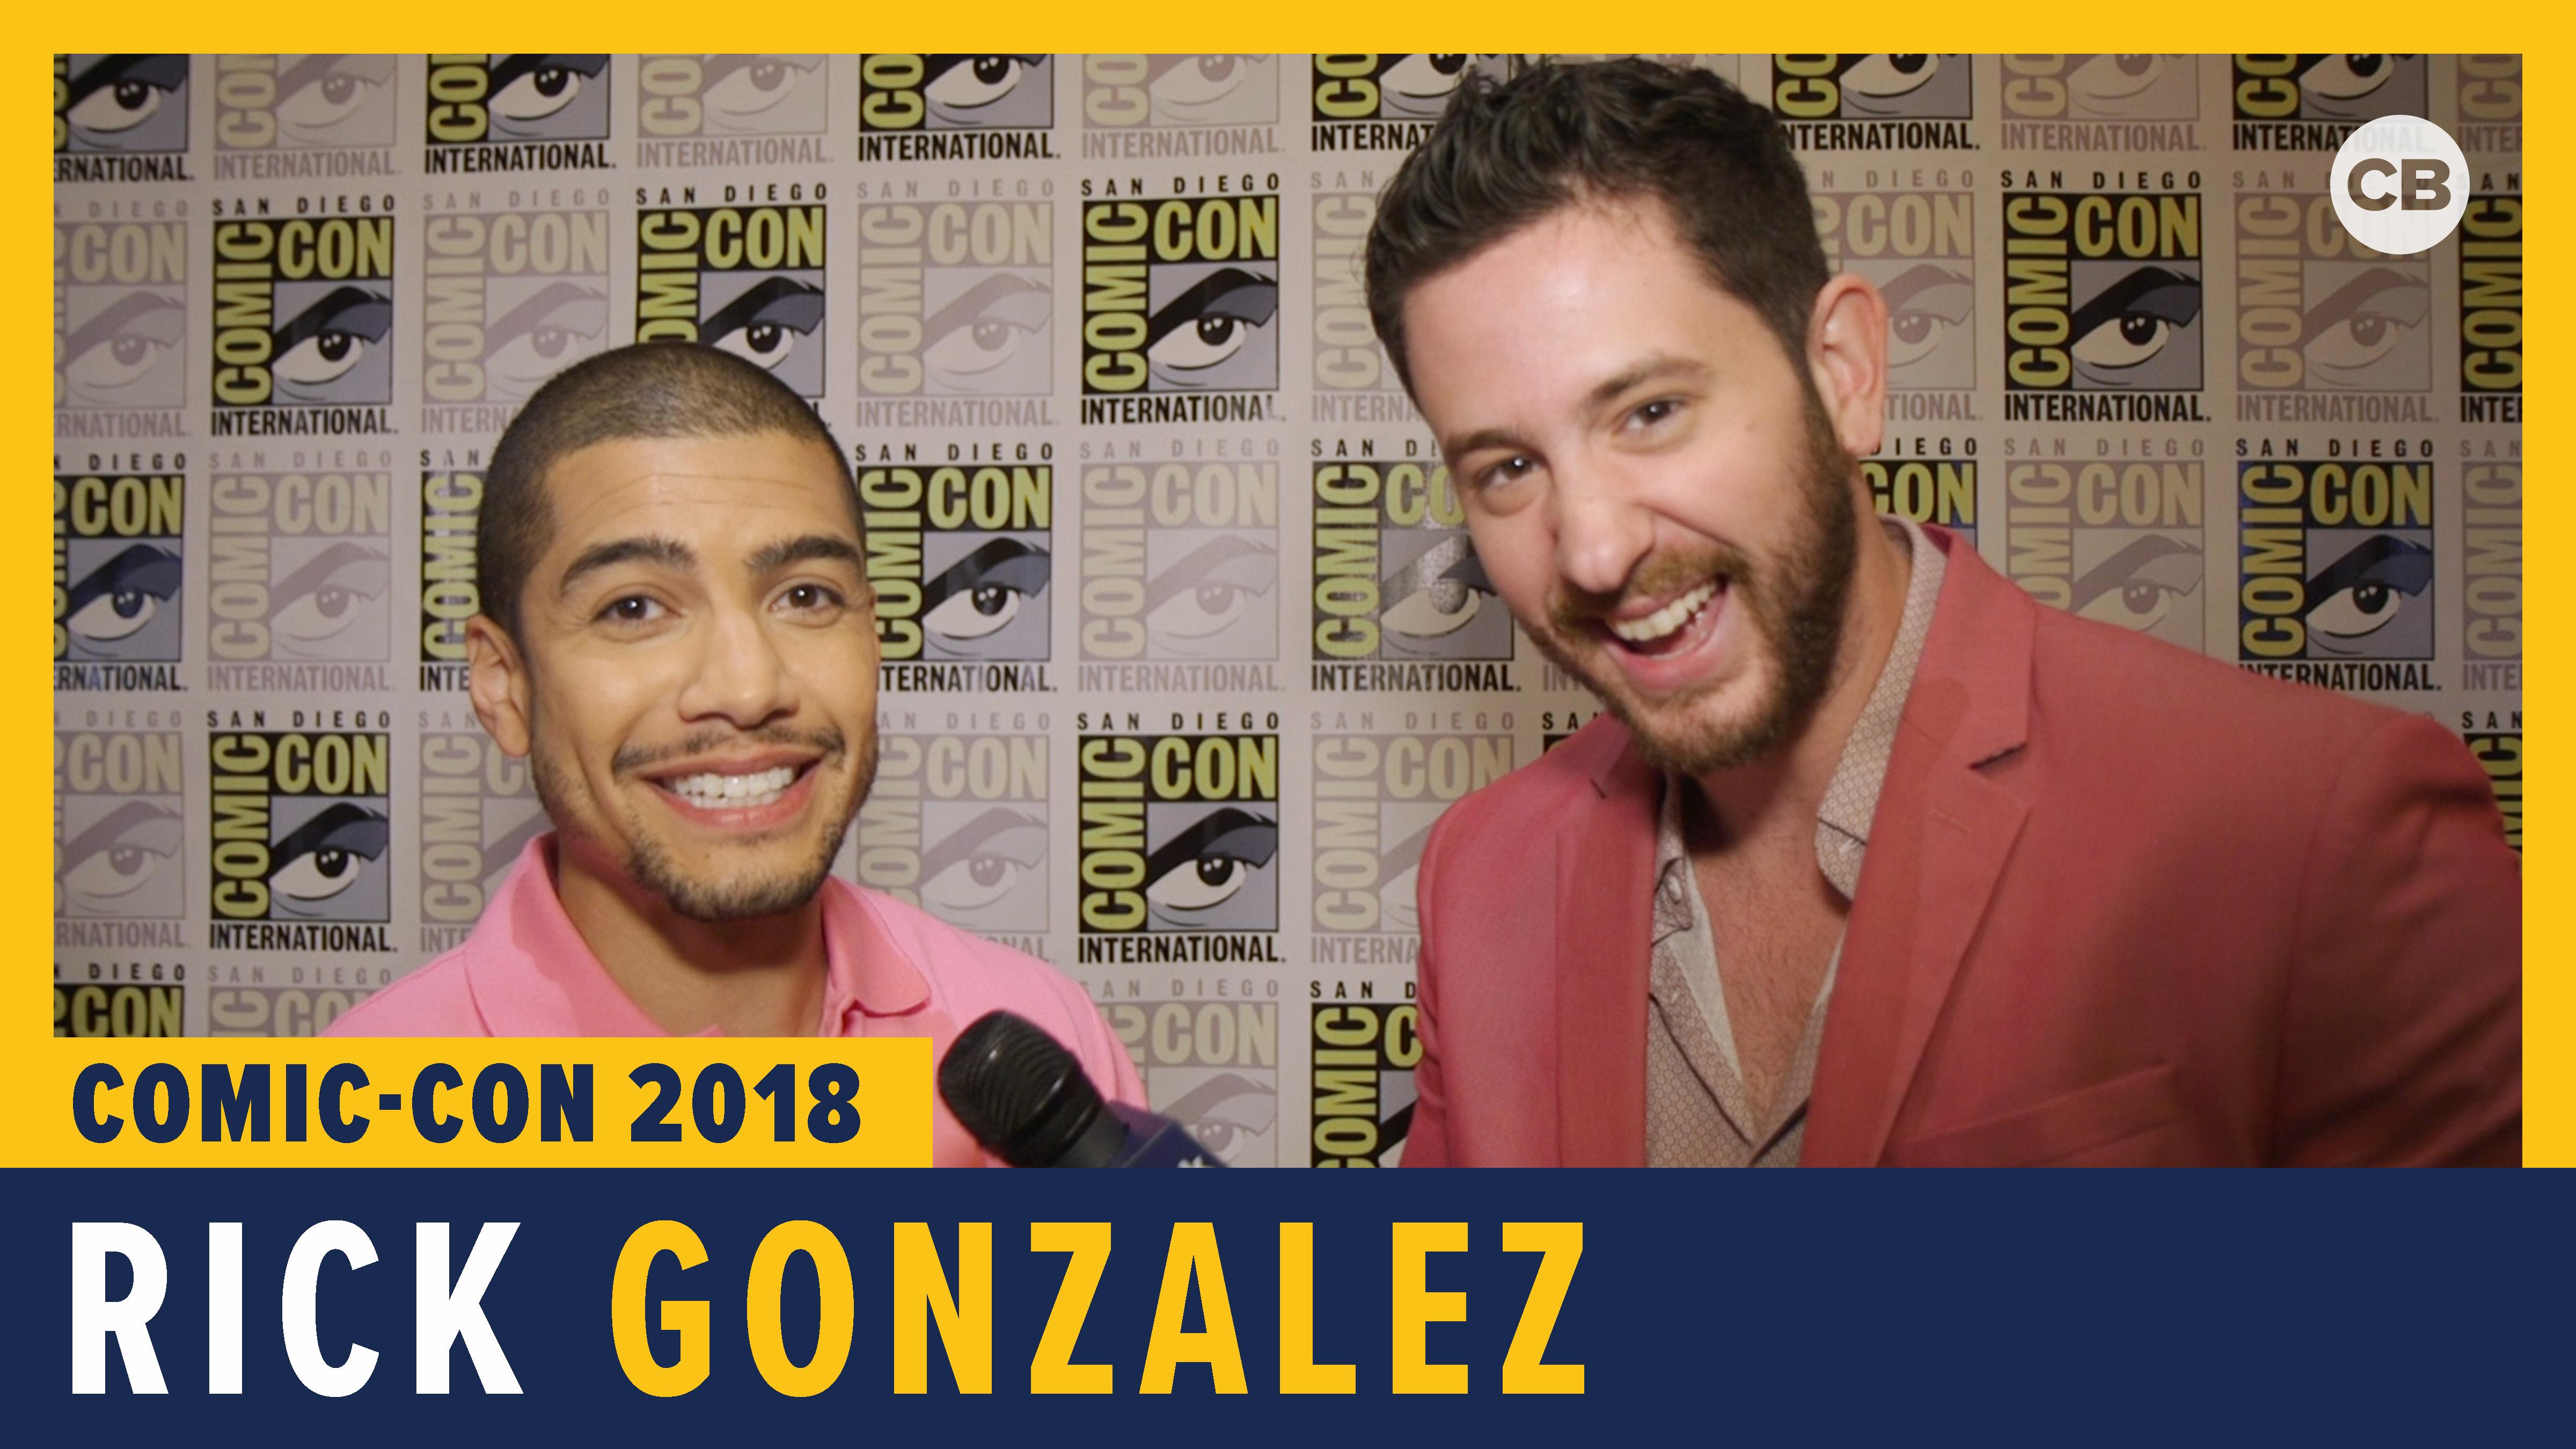 Rick Gonzalez - SDCC 2018 Exclusive Interview screen capture